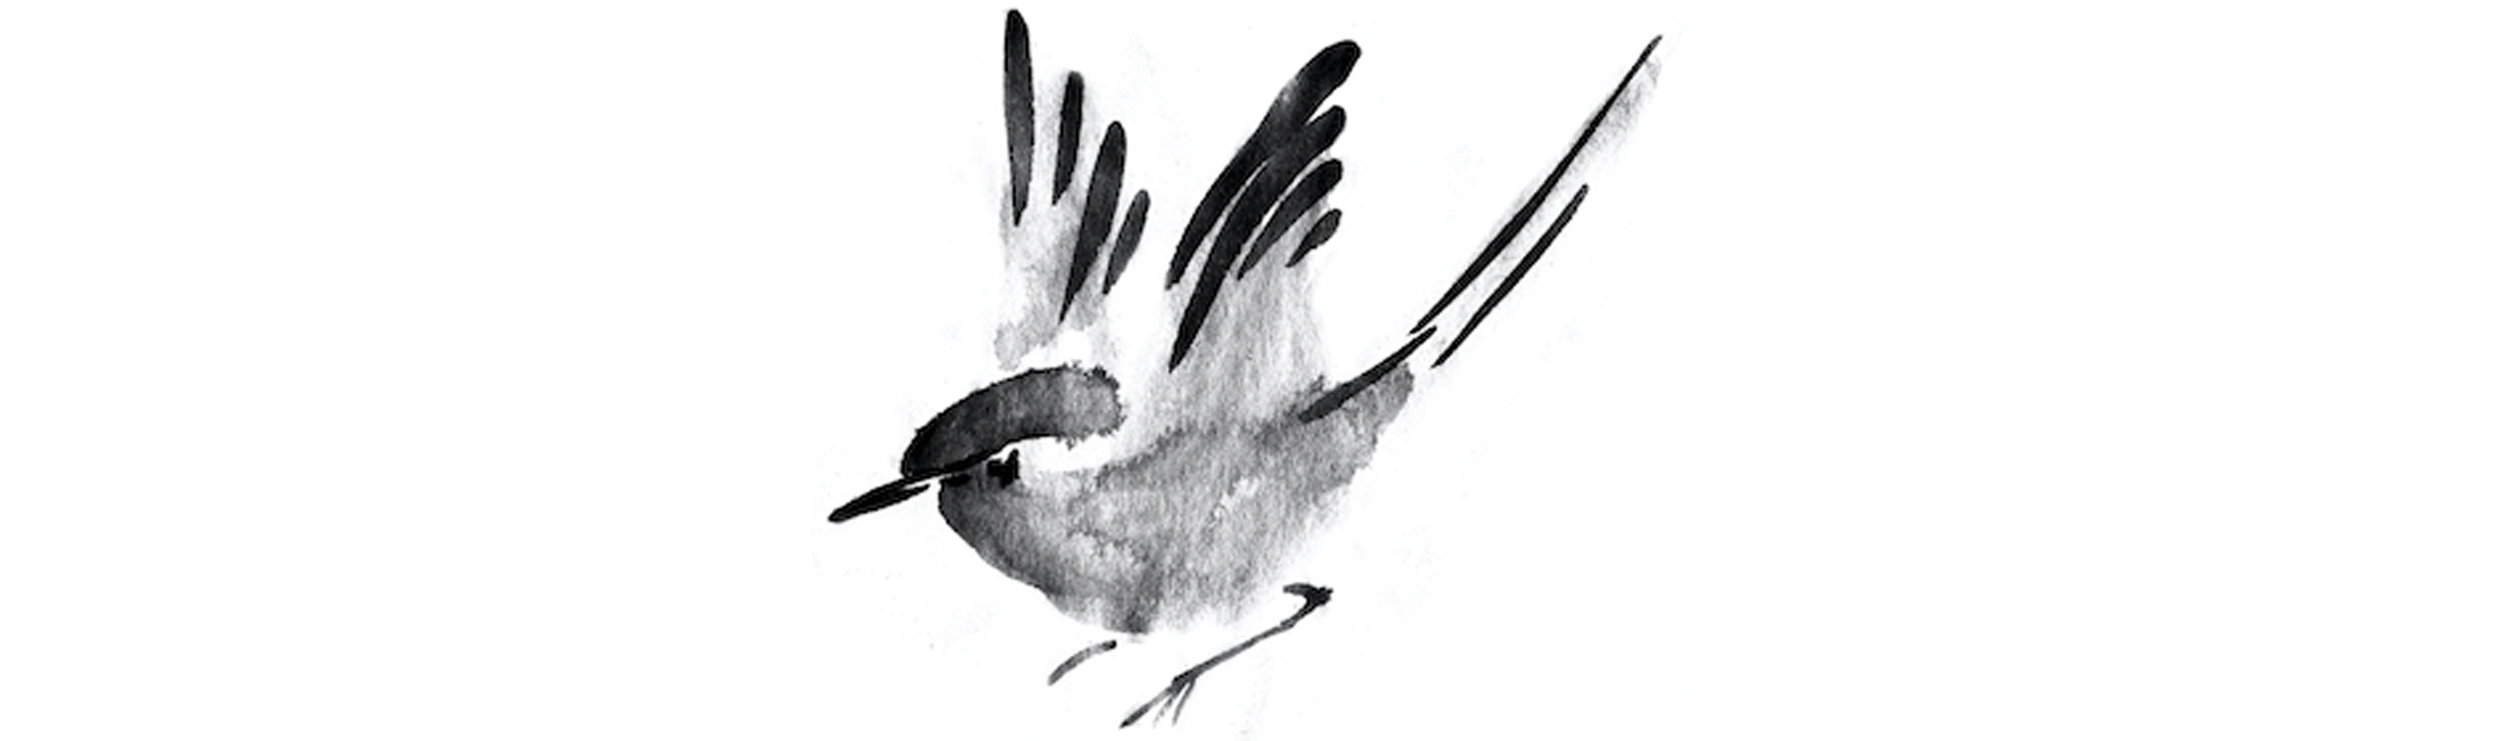 birds breaker2.jpg